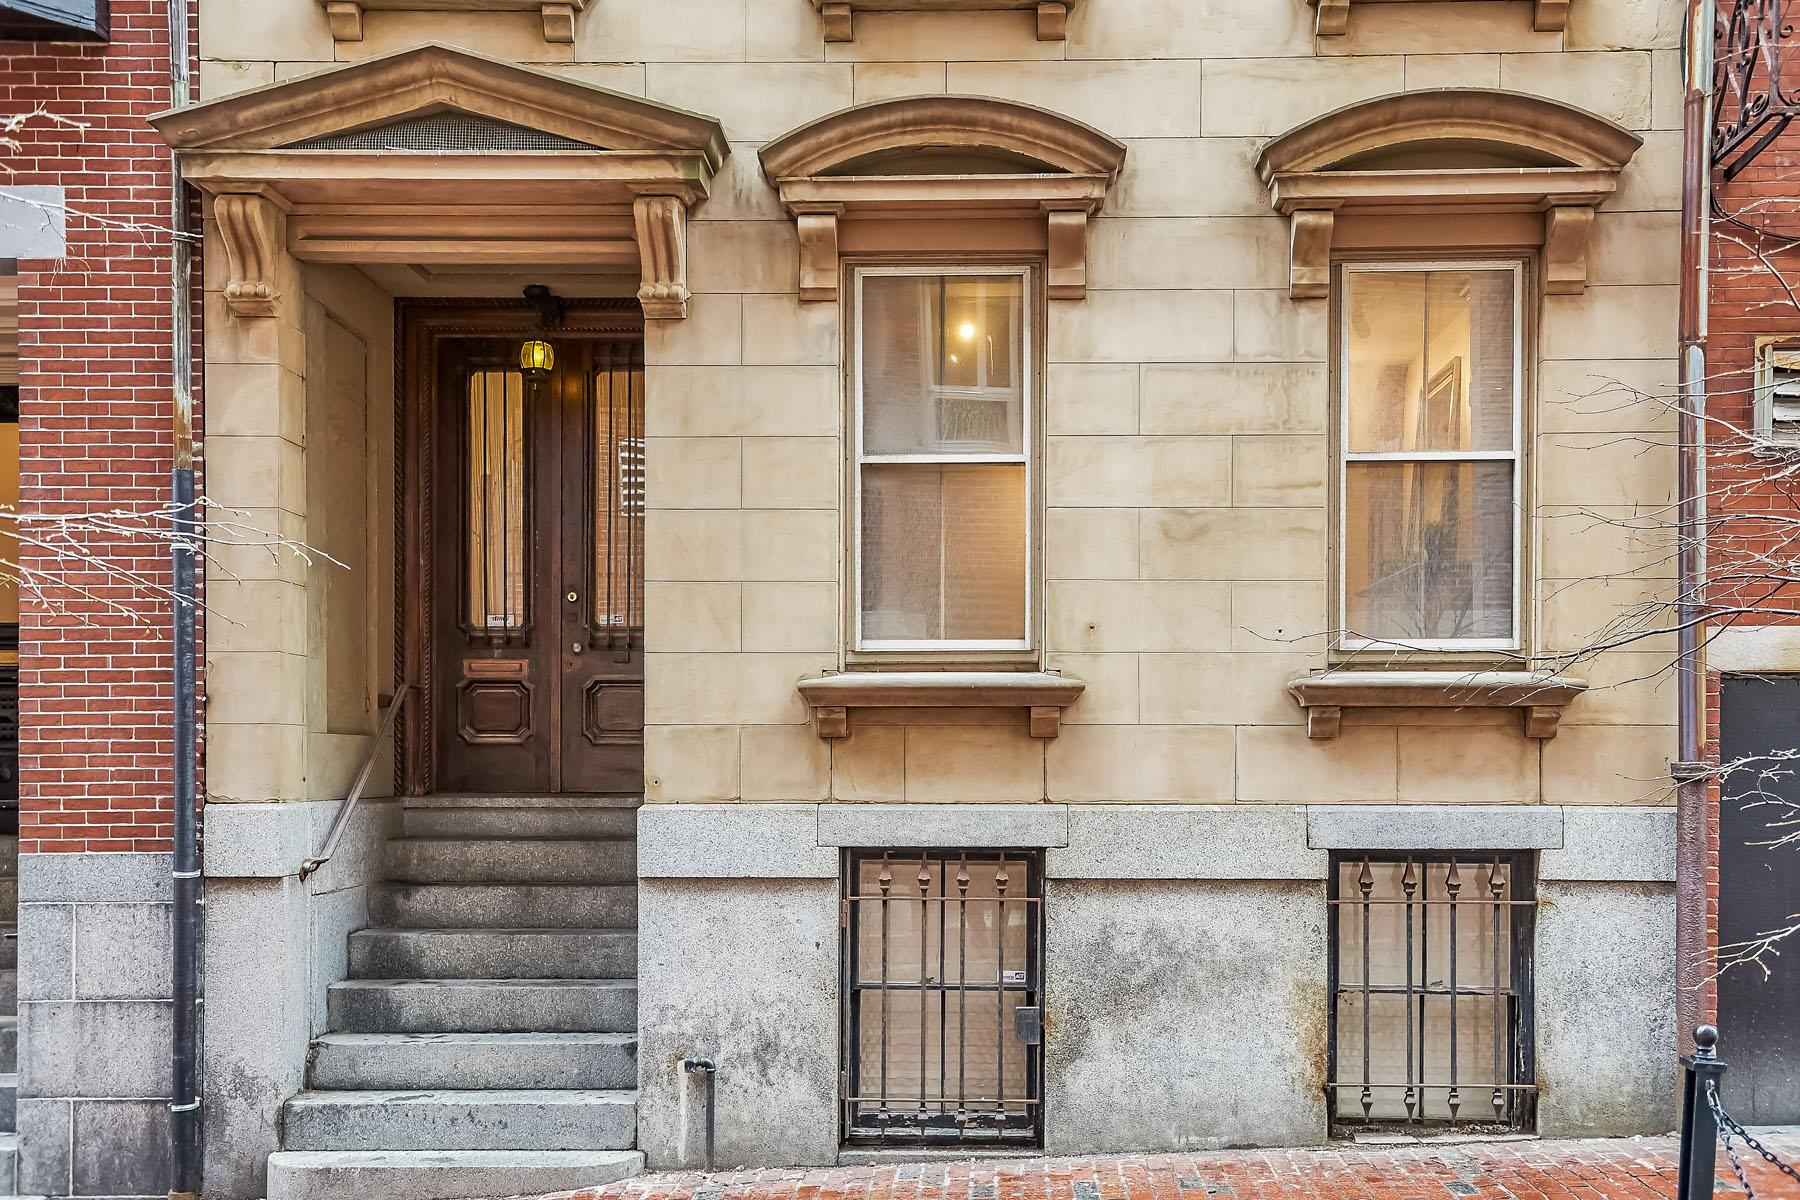 Кооперативная квартира для того Продажа на 60 Temple Street 60, Boston 60 Temple St 60 Boston, Массачусетс, 02114 Соединенные Штаты